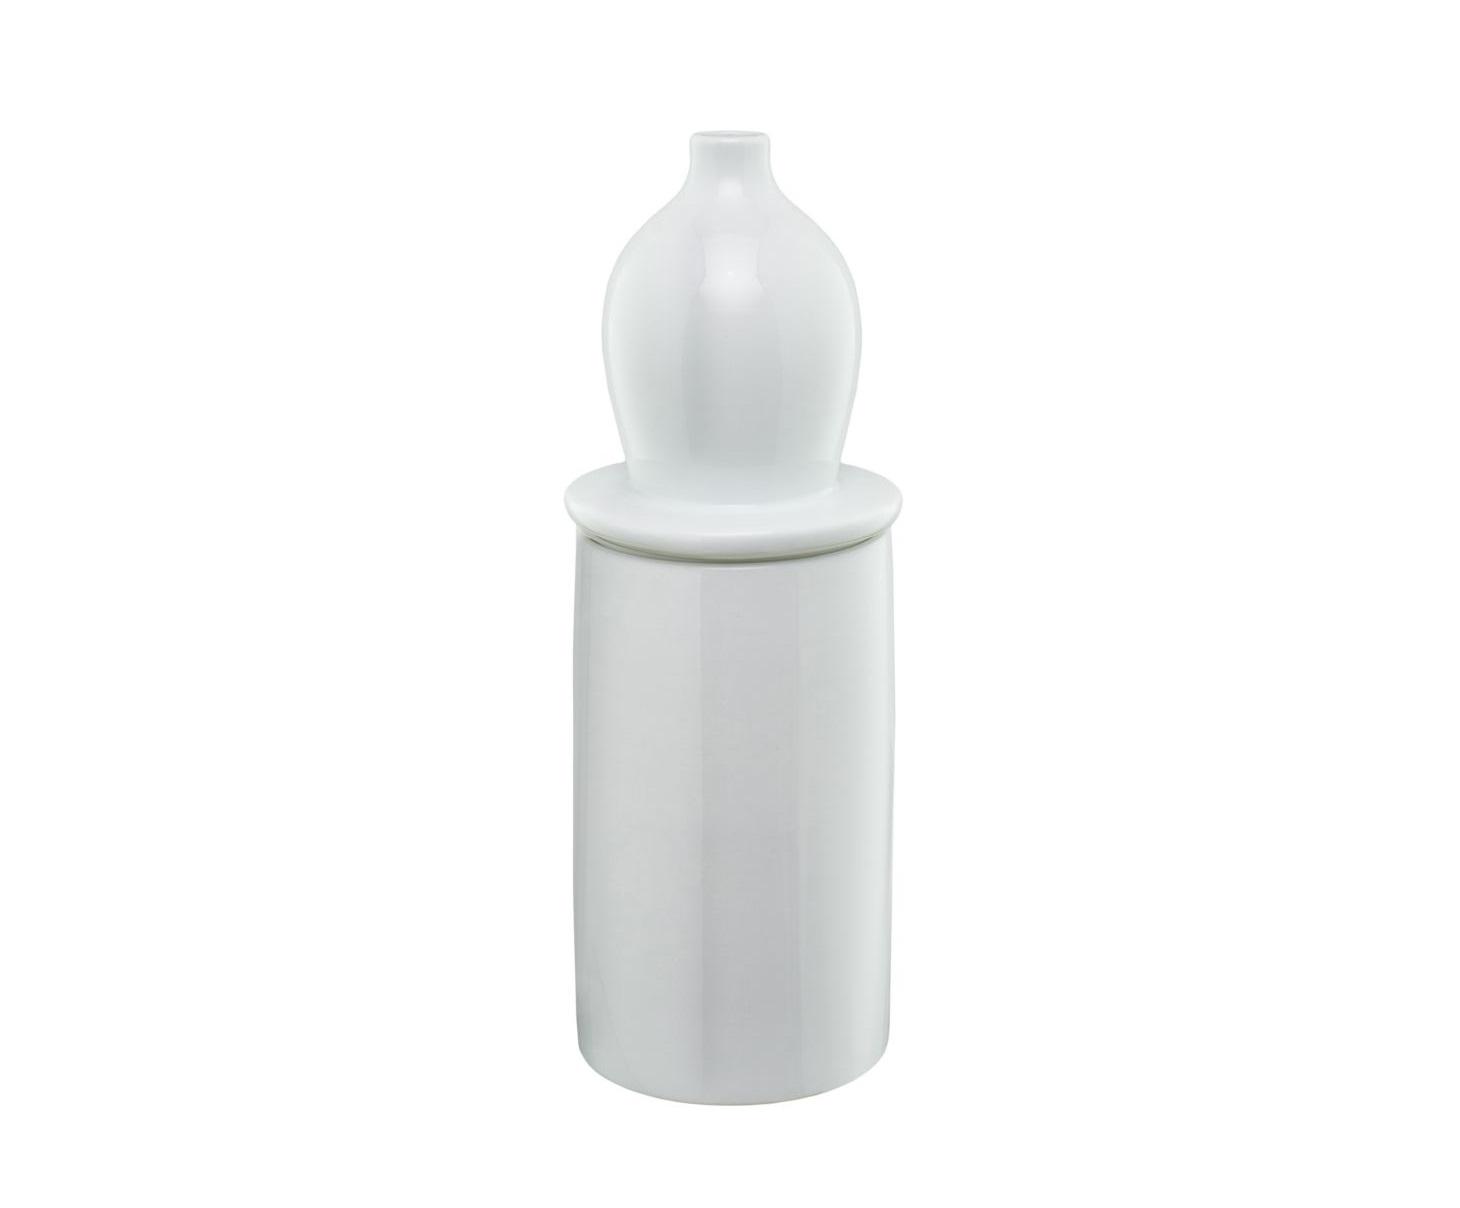 Декоративная ваза M-Style 15441166 от thefurnish